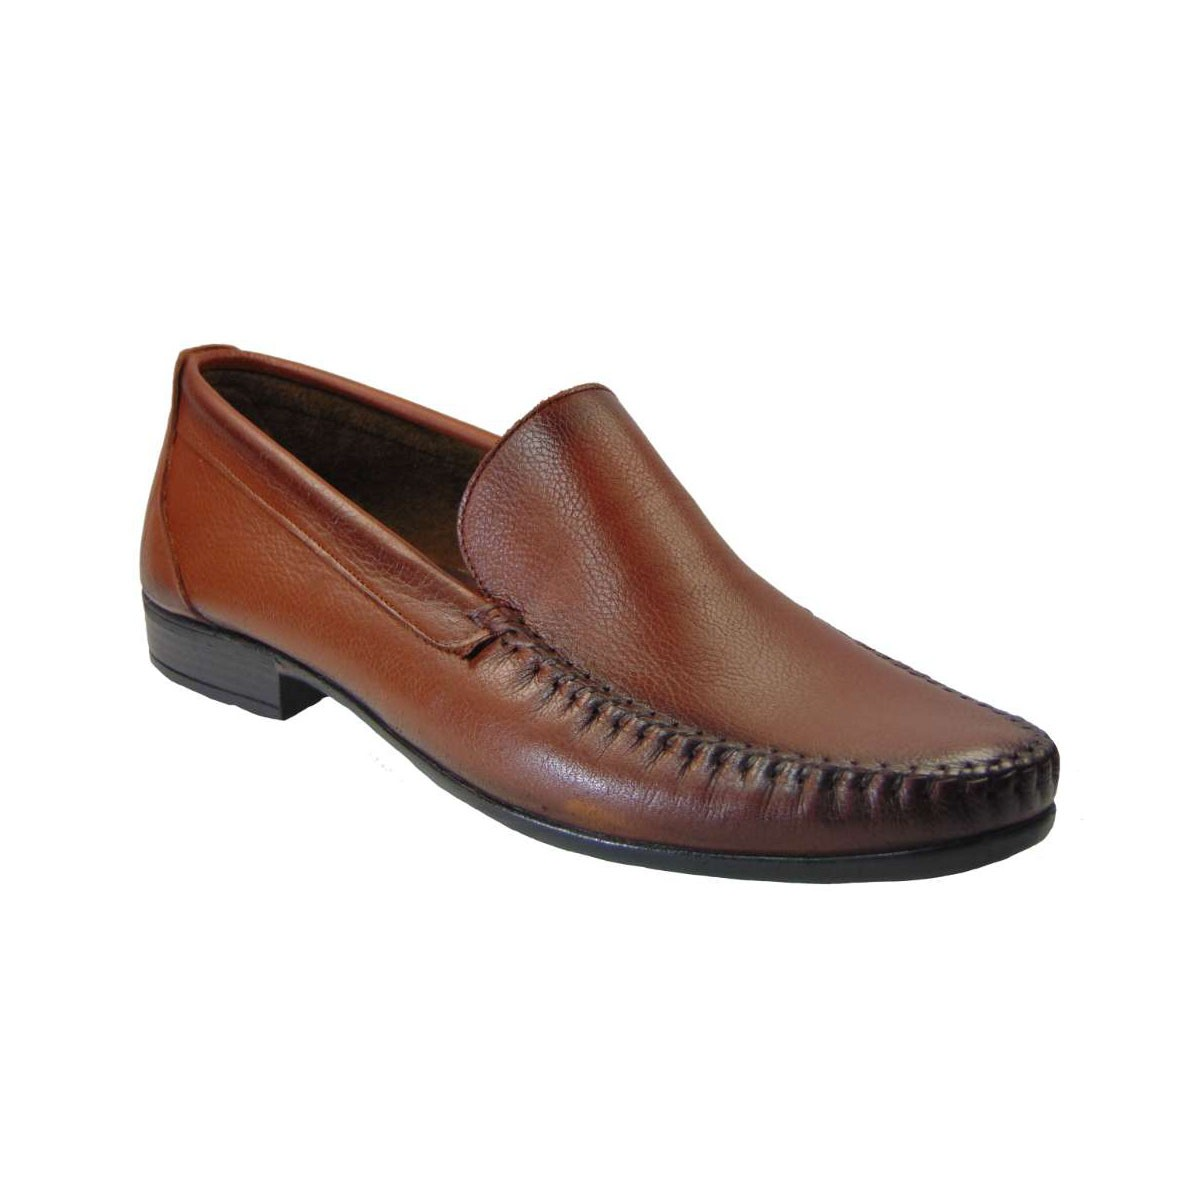 Tsimpolis Shoes 708 Slip On Απο Γνήσιο Δέρμα Ταμπά